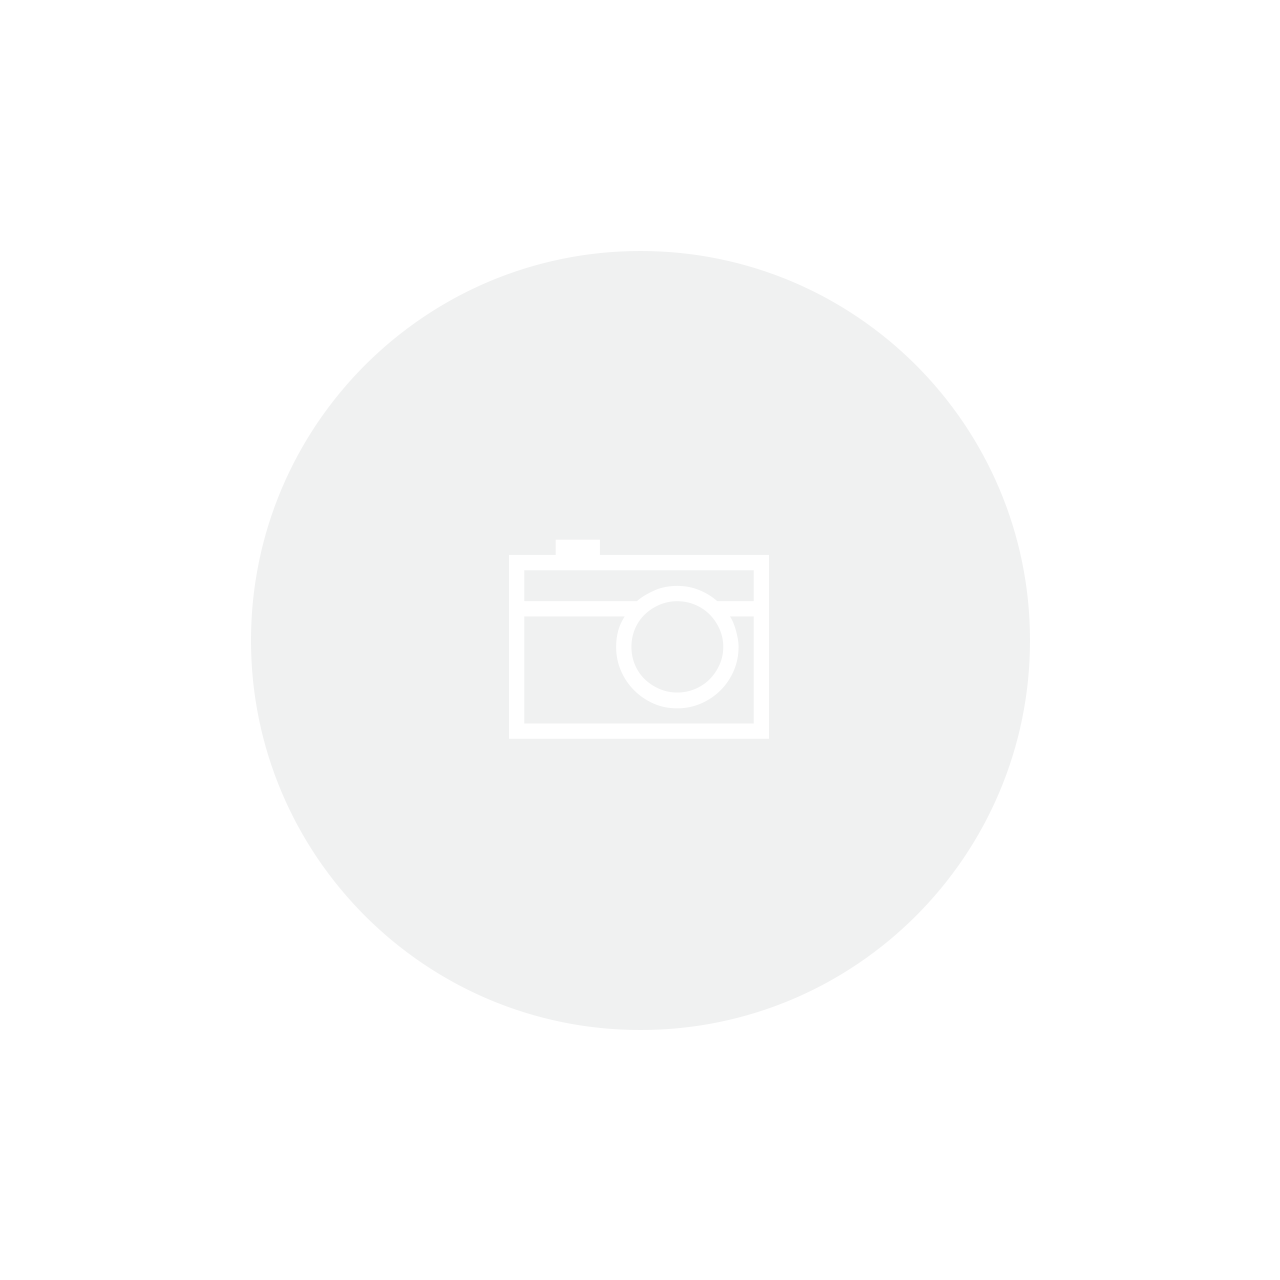 Batedor Manual Branco Tramontina